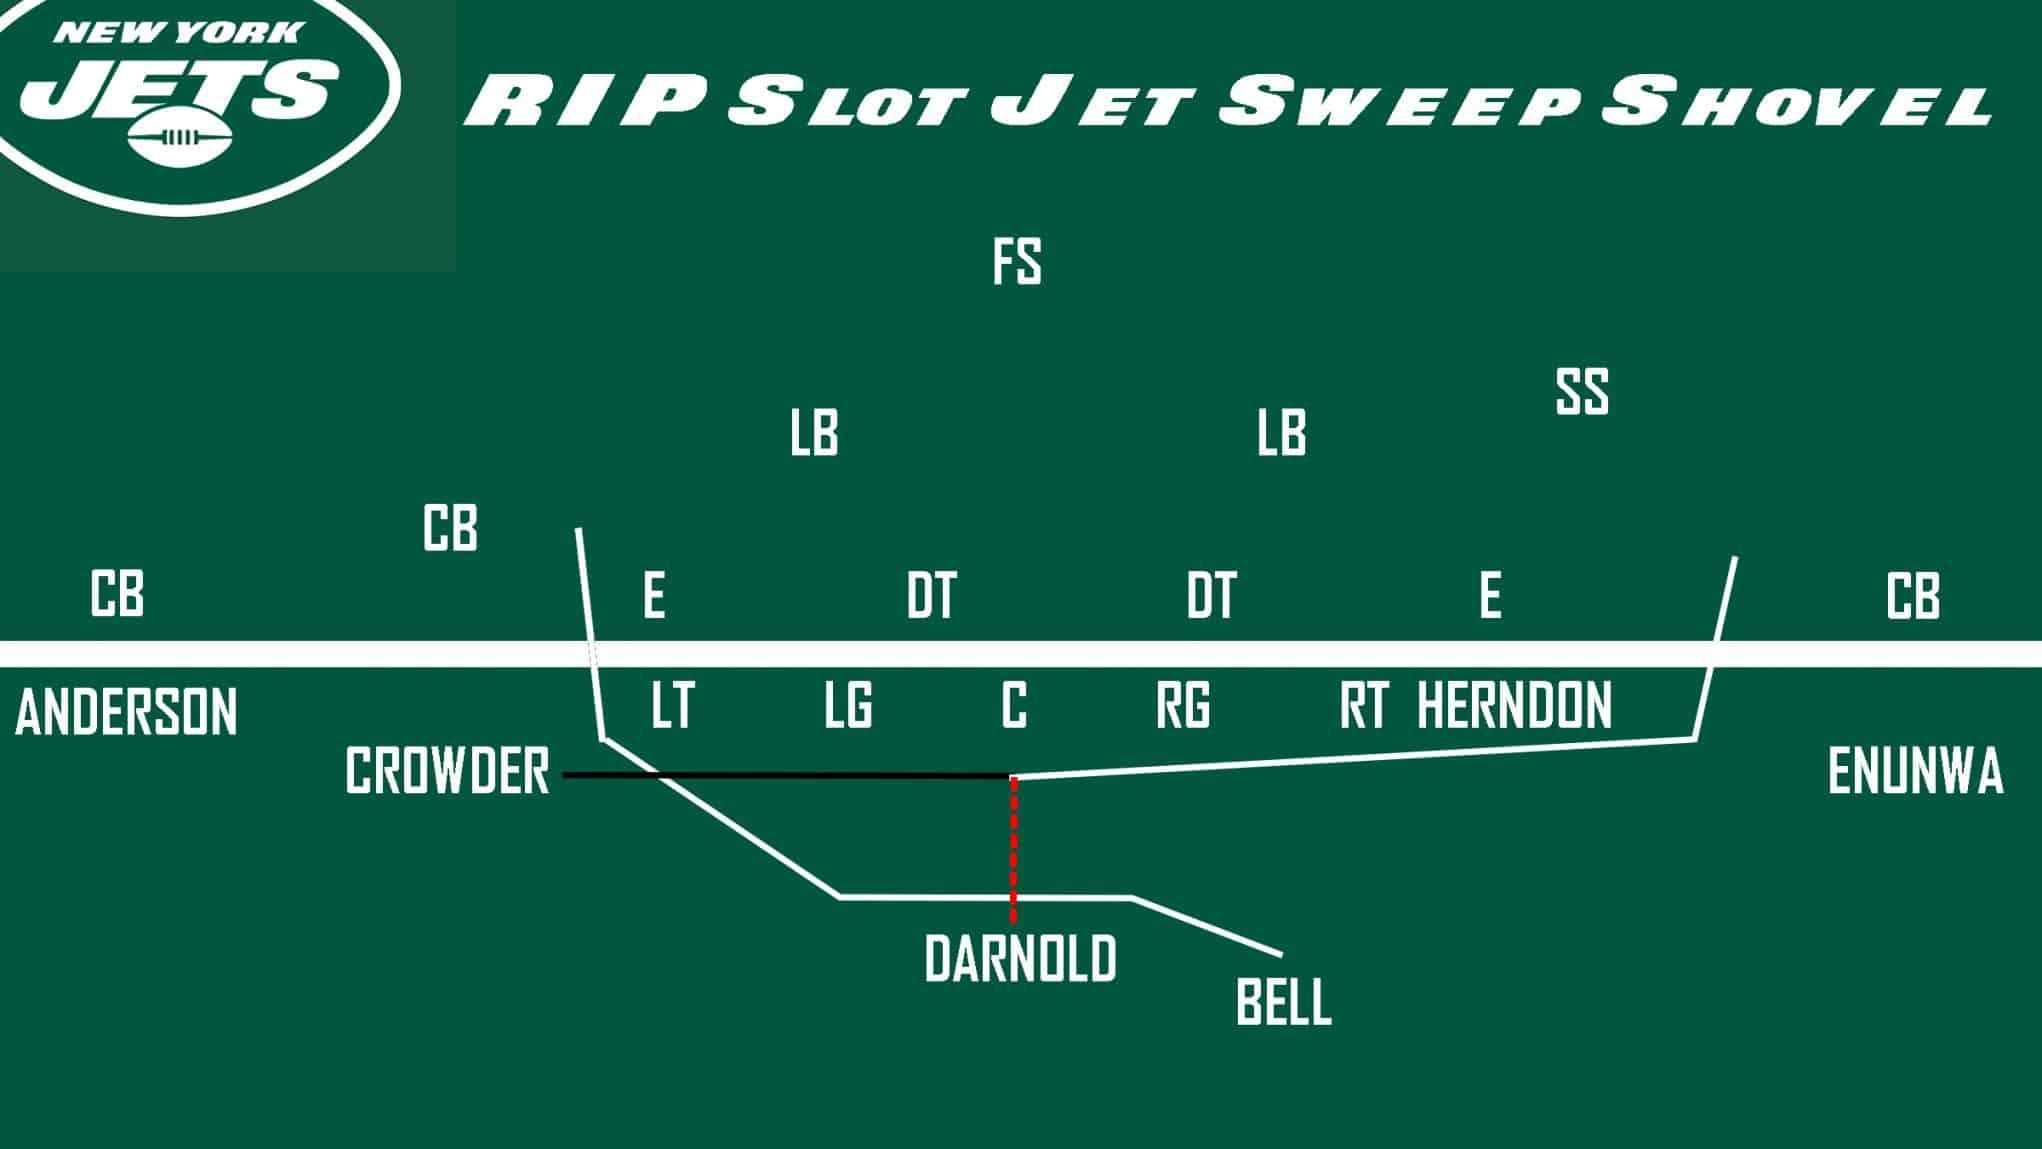 Jets Slot Jet Sweep